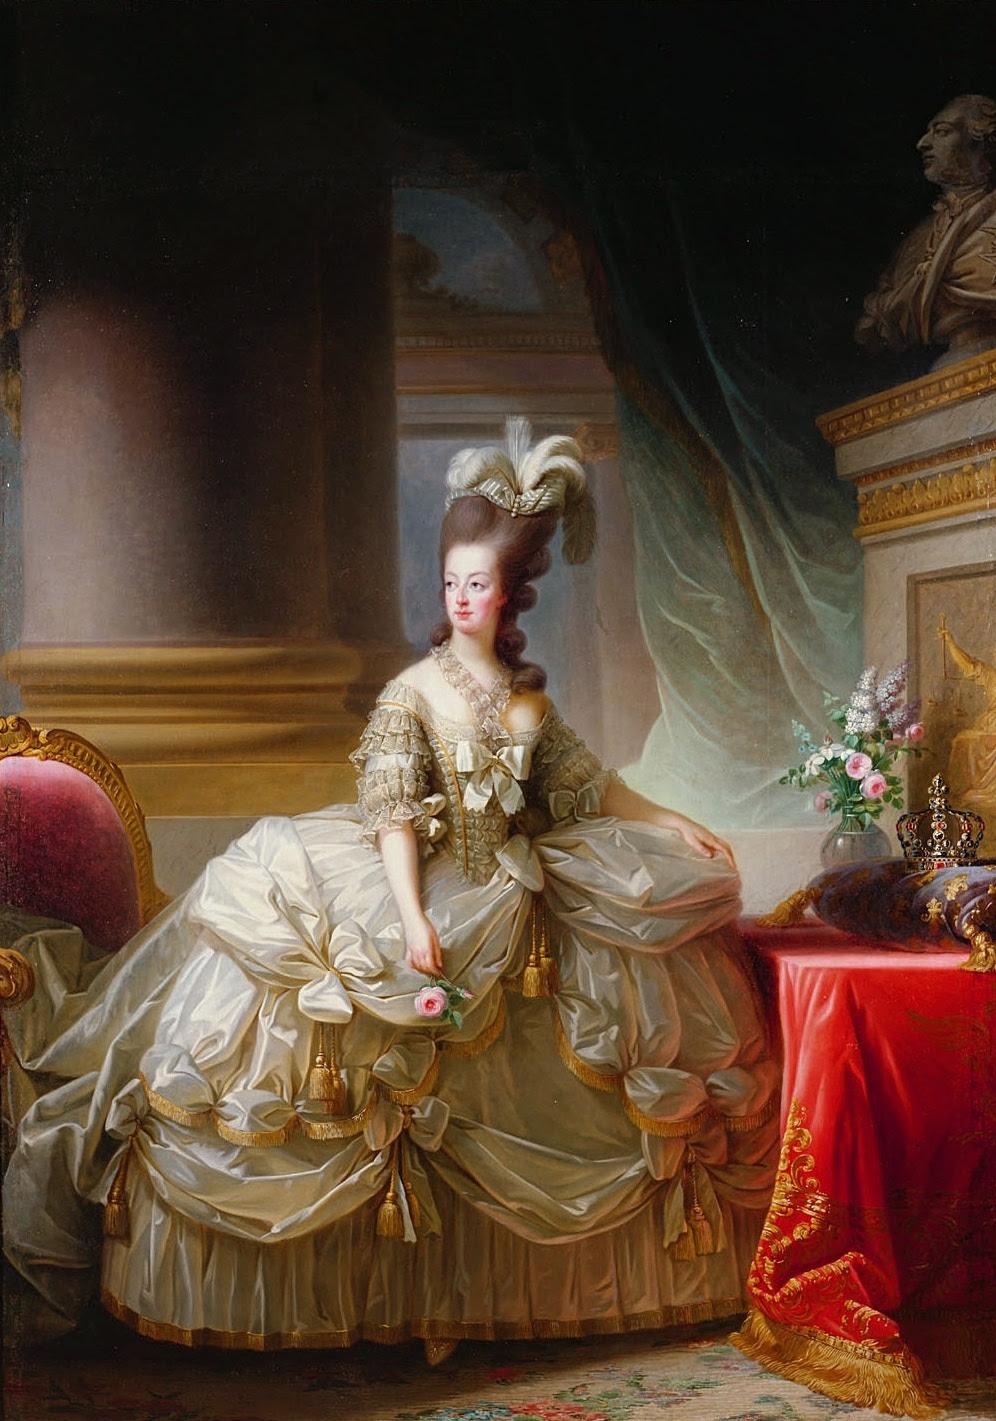 Elisabeth Vigée-Lebrun: Queen Marie Antoinette of France